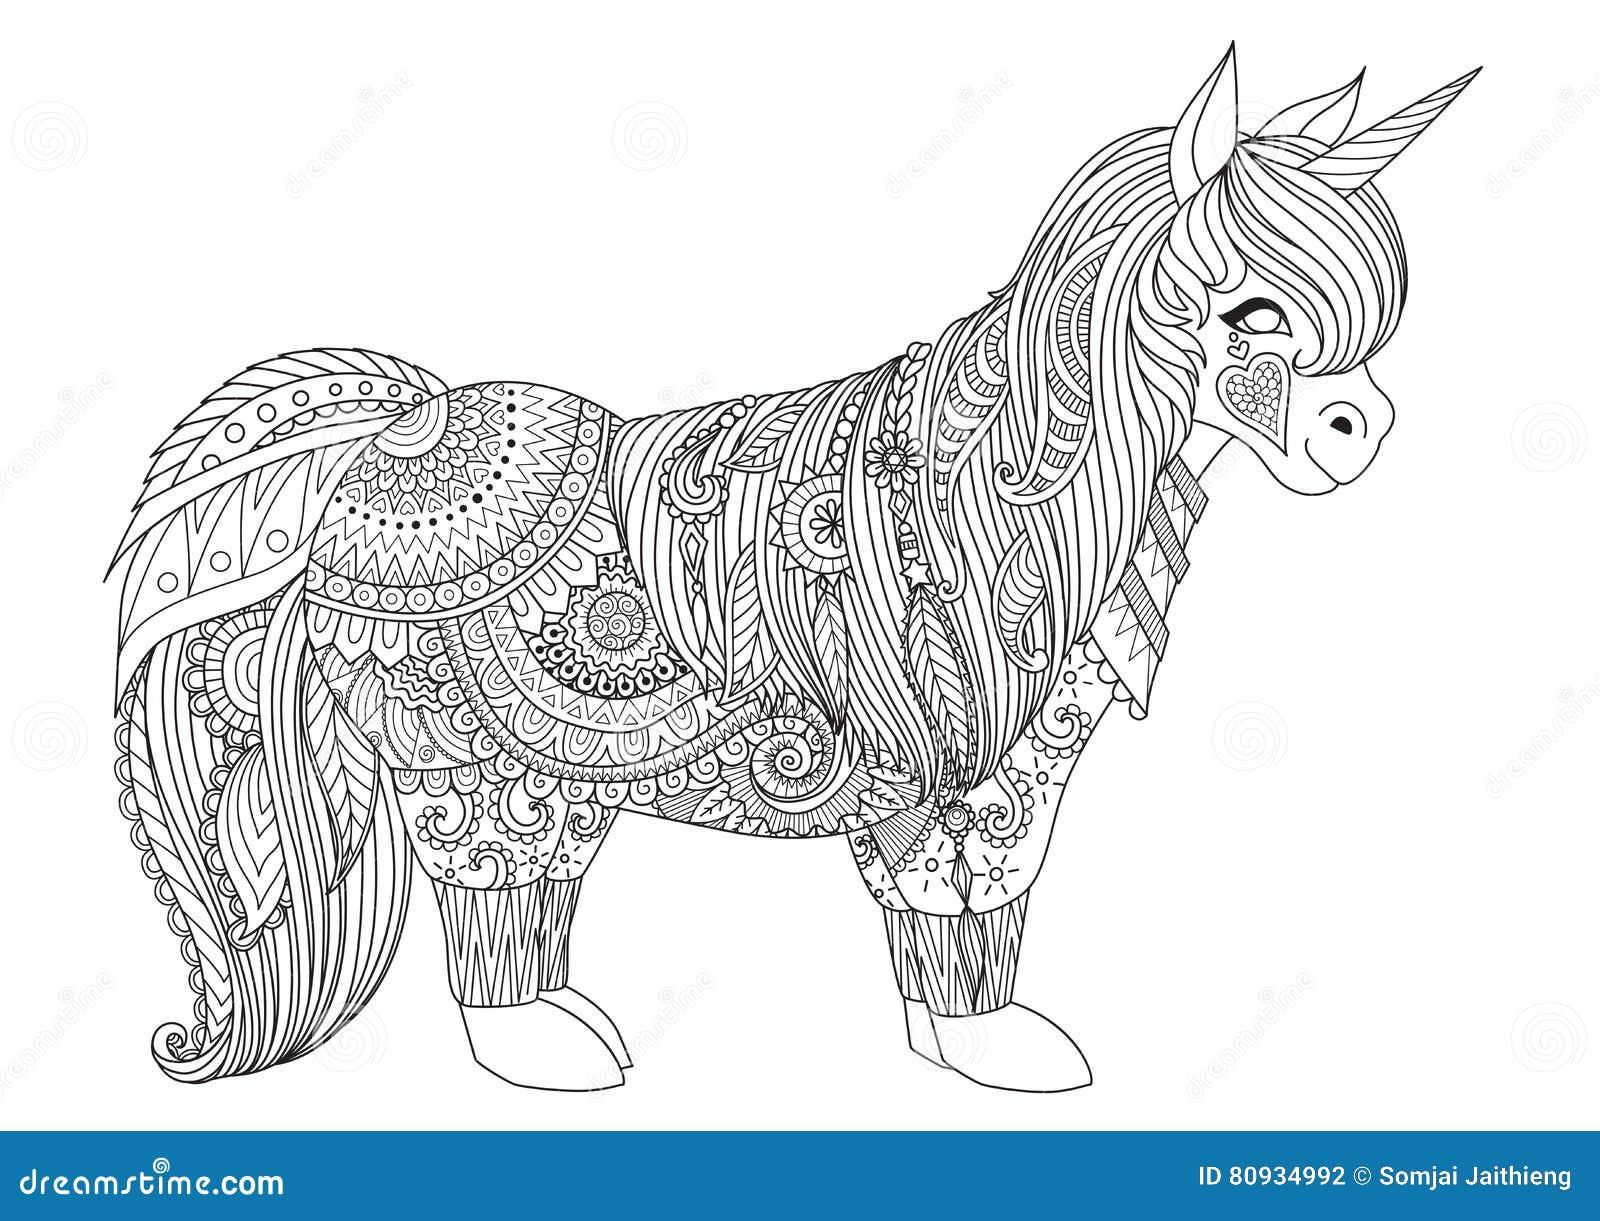 Ze zen inspiration coloring book - Zen Inspiration Coloring Book Zentangle Inspired Design Of Happy Little Pony For Adult Coloring Book